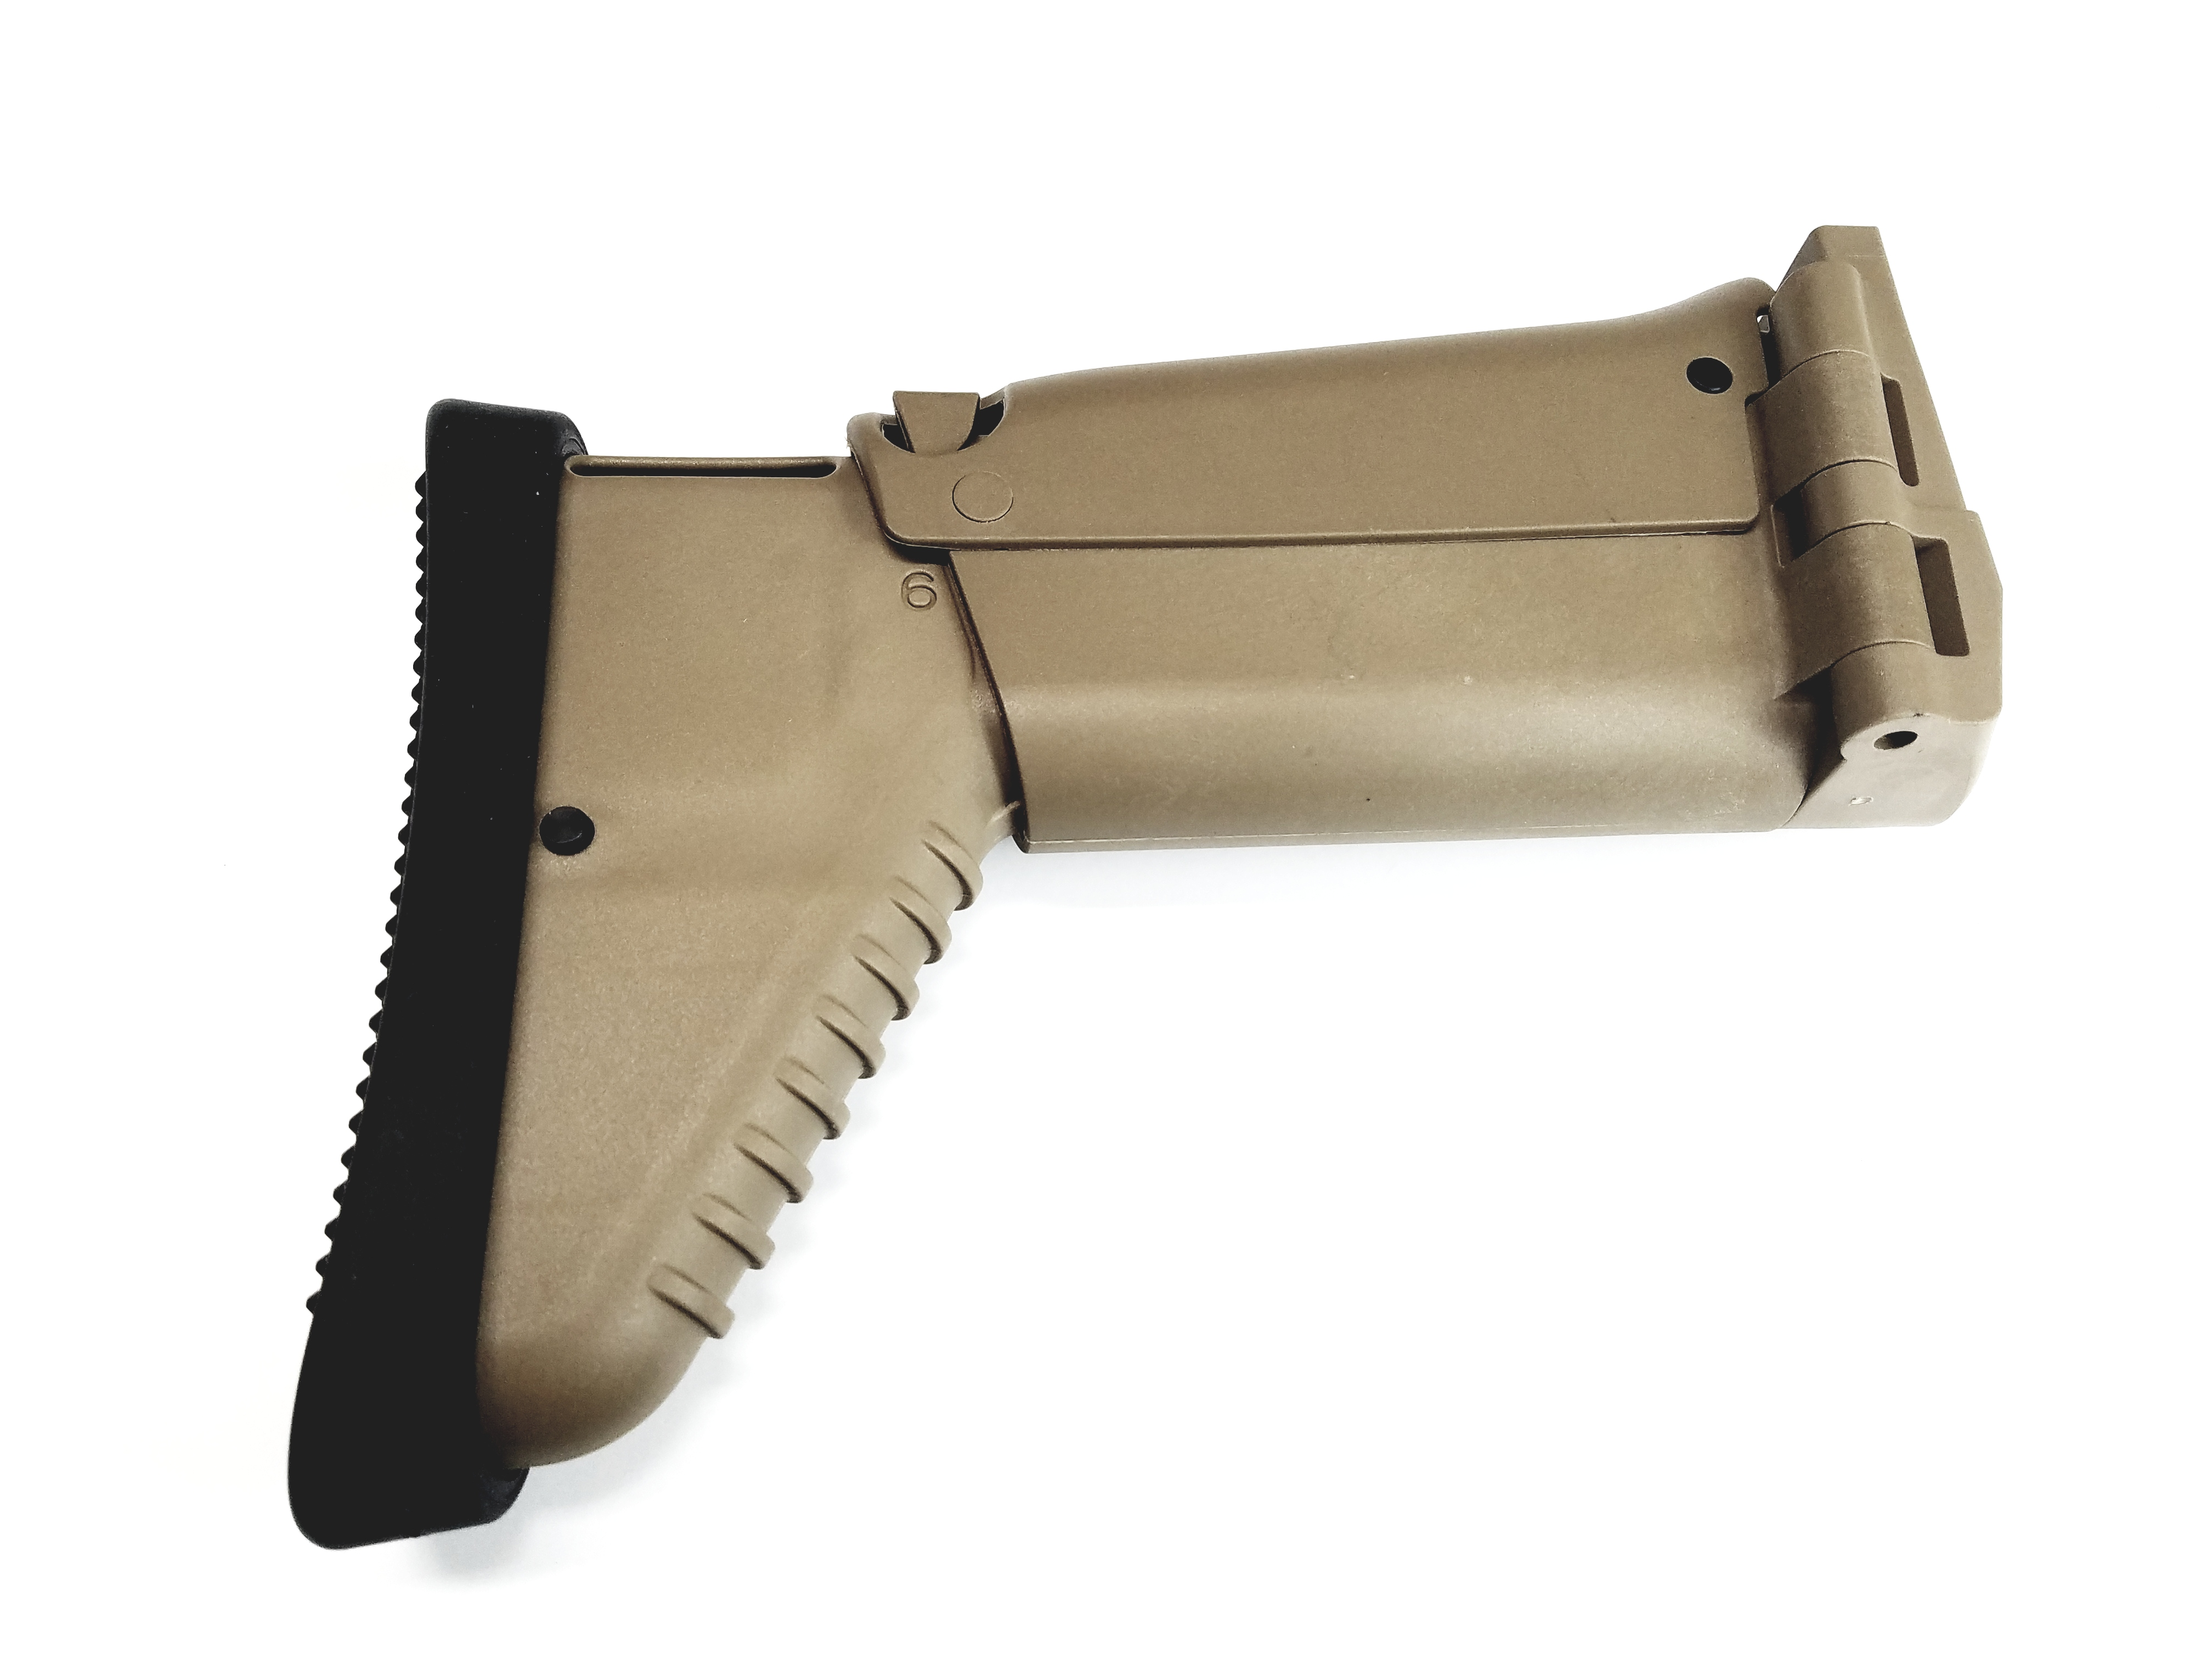 FN SCAR 16 / SCAR 17 Stock Assembly - FDE